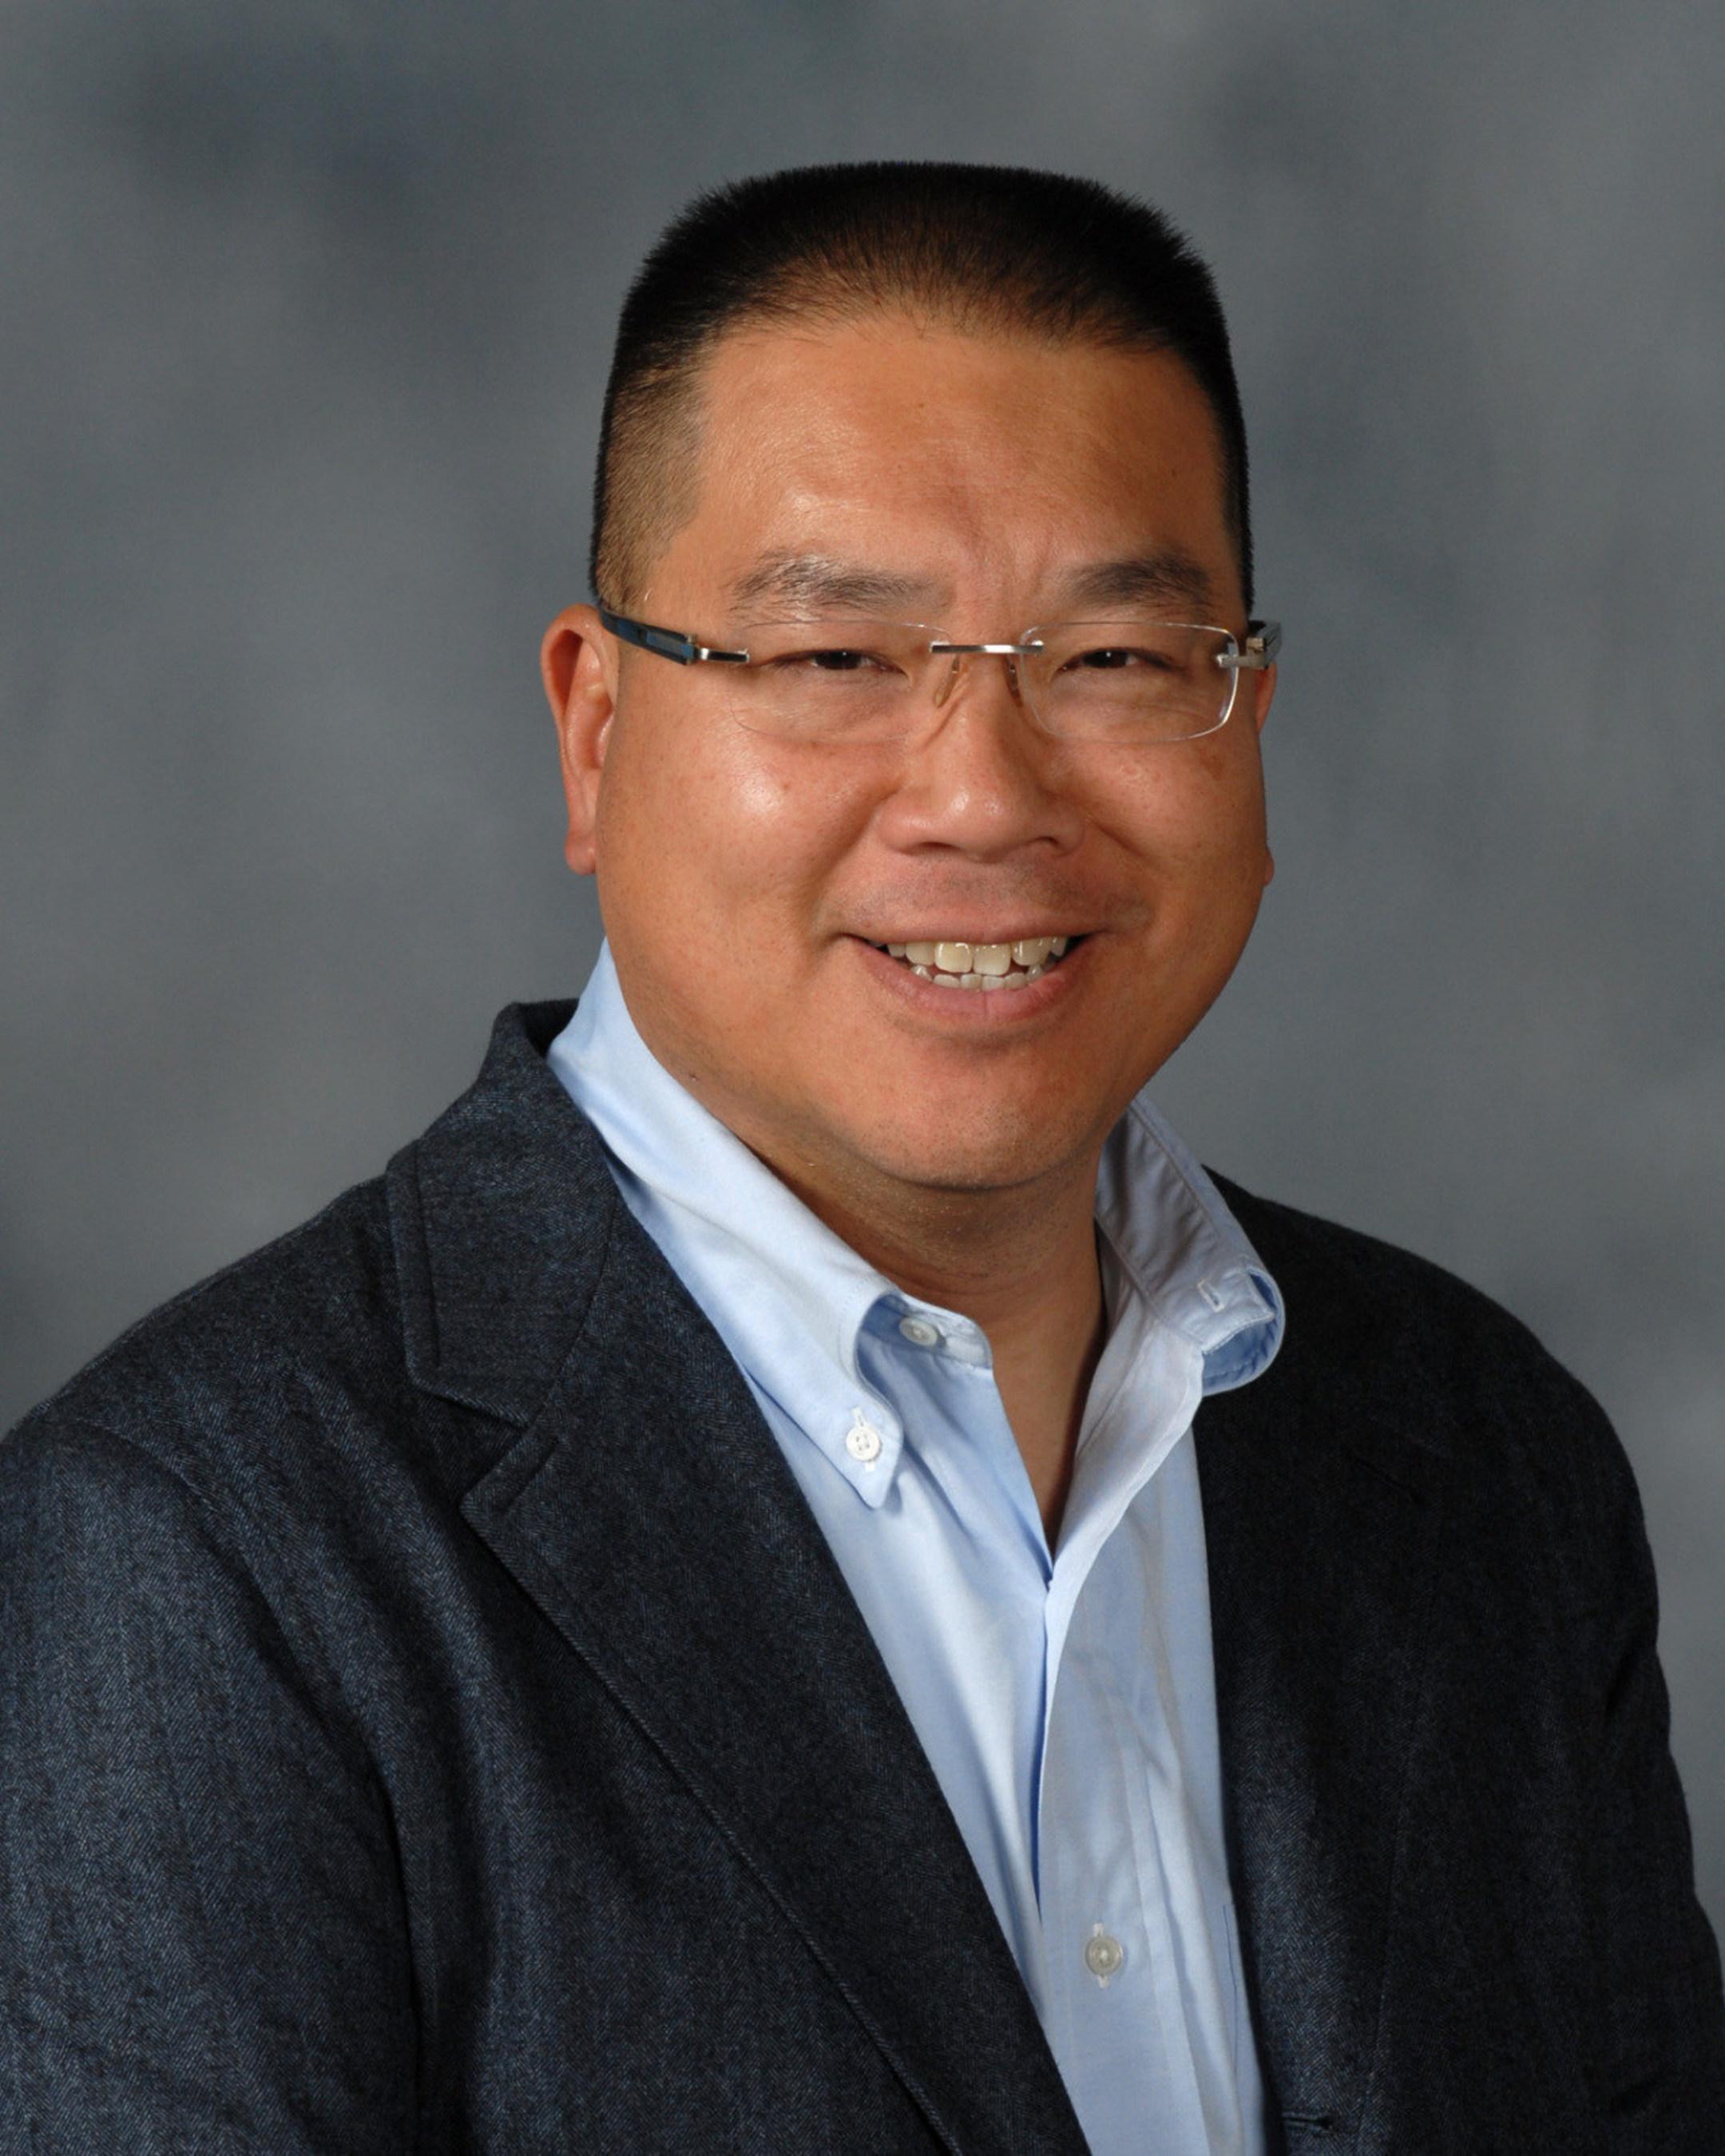 Michael D. Hsu, Kimberly-Clark Corporation